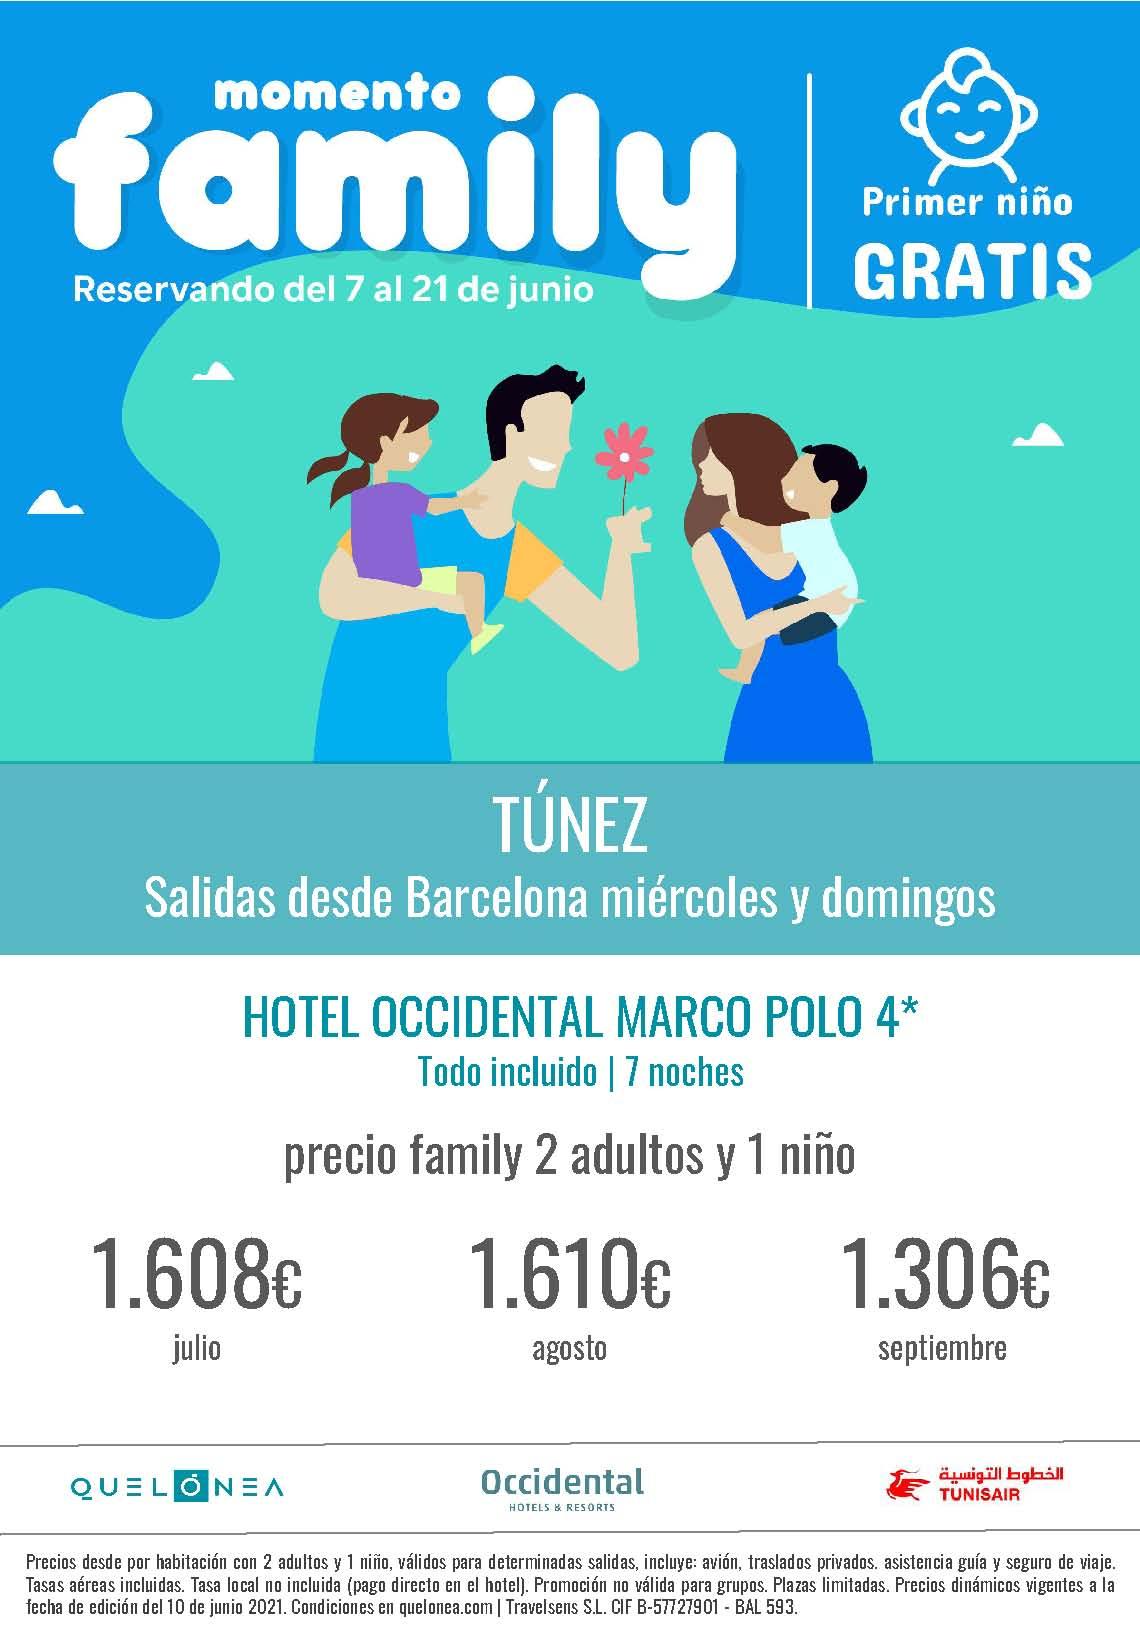 Oferta Quelonea Familias Niños Gratis Tunez Verano 2021 salidas desde Barcelona